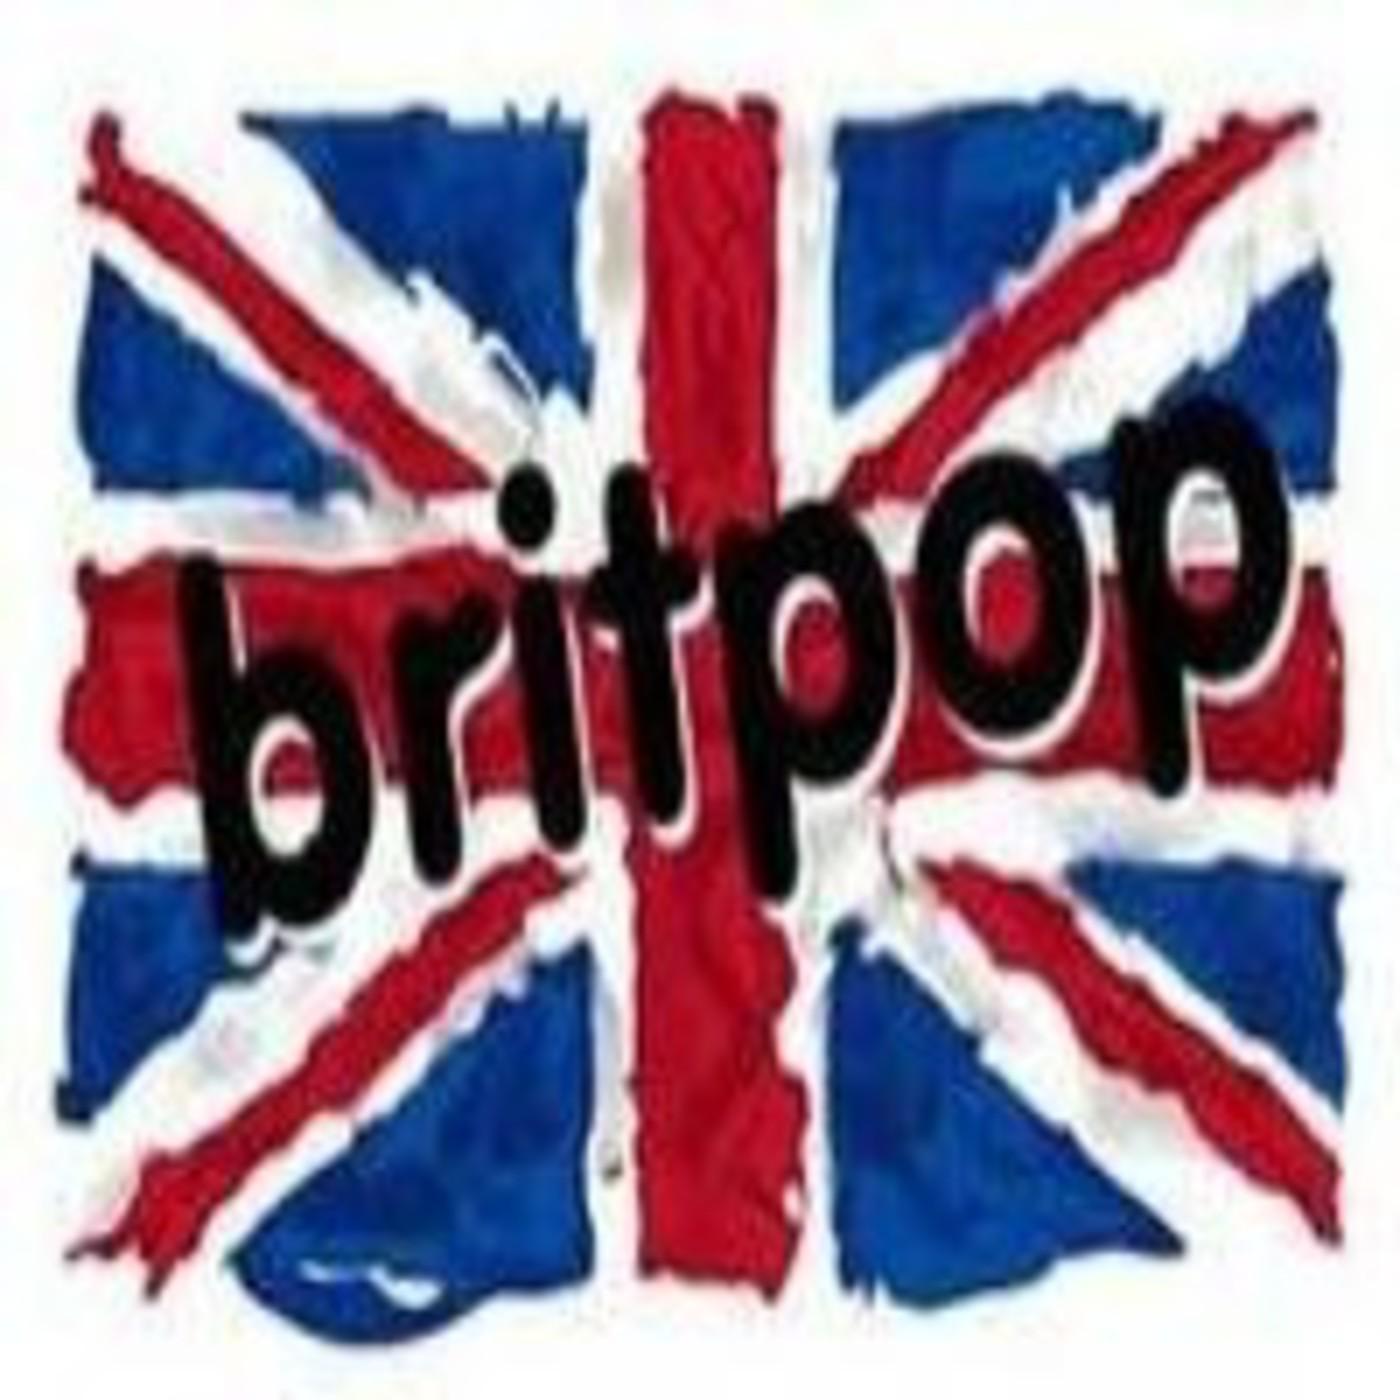 In-diferent: British Songs 2014/15